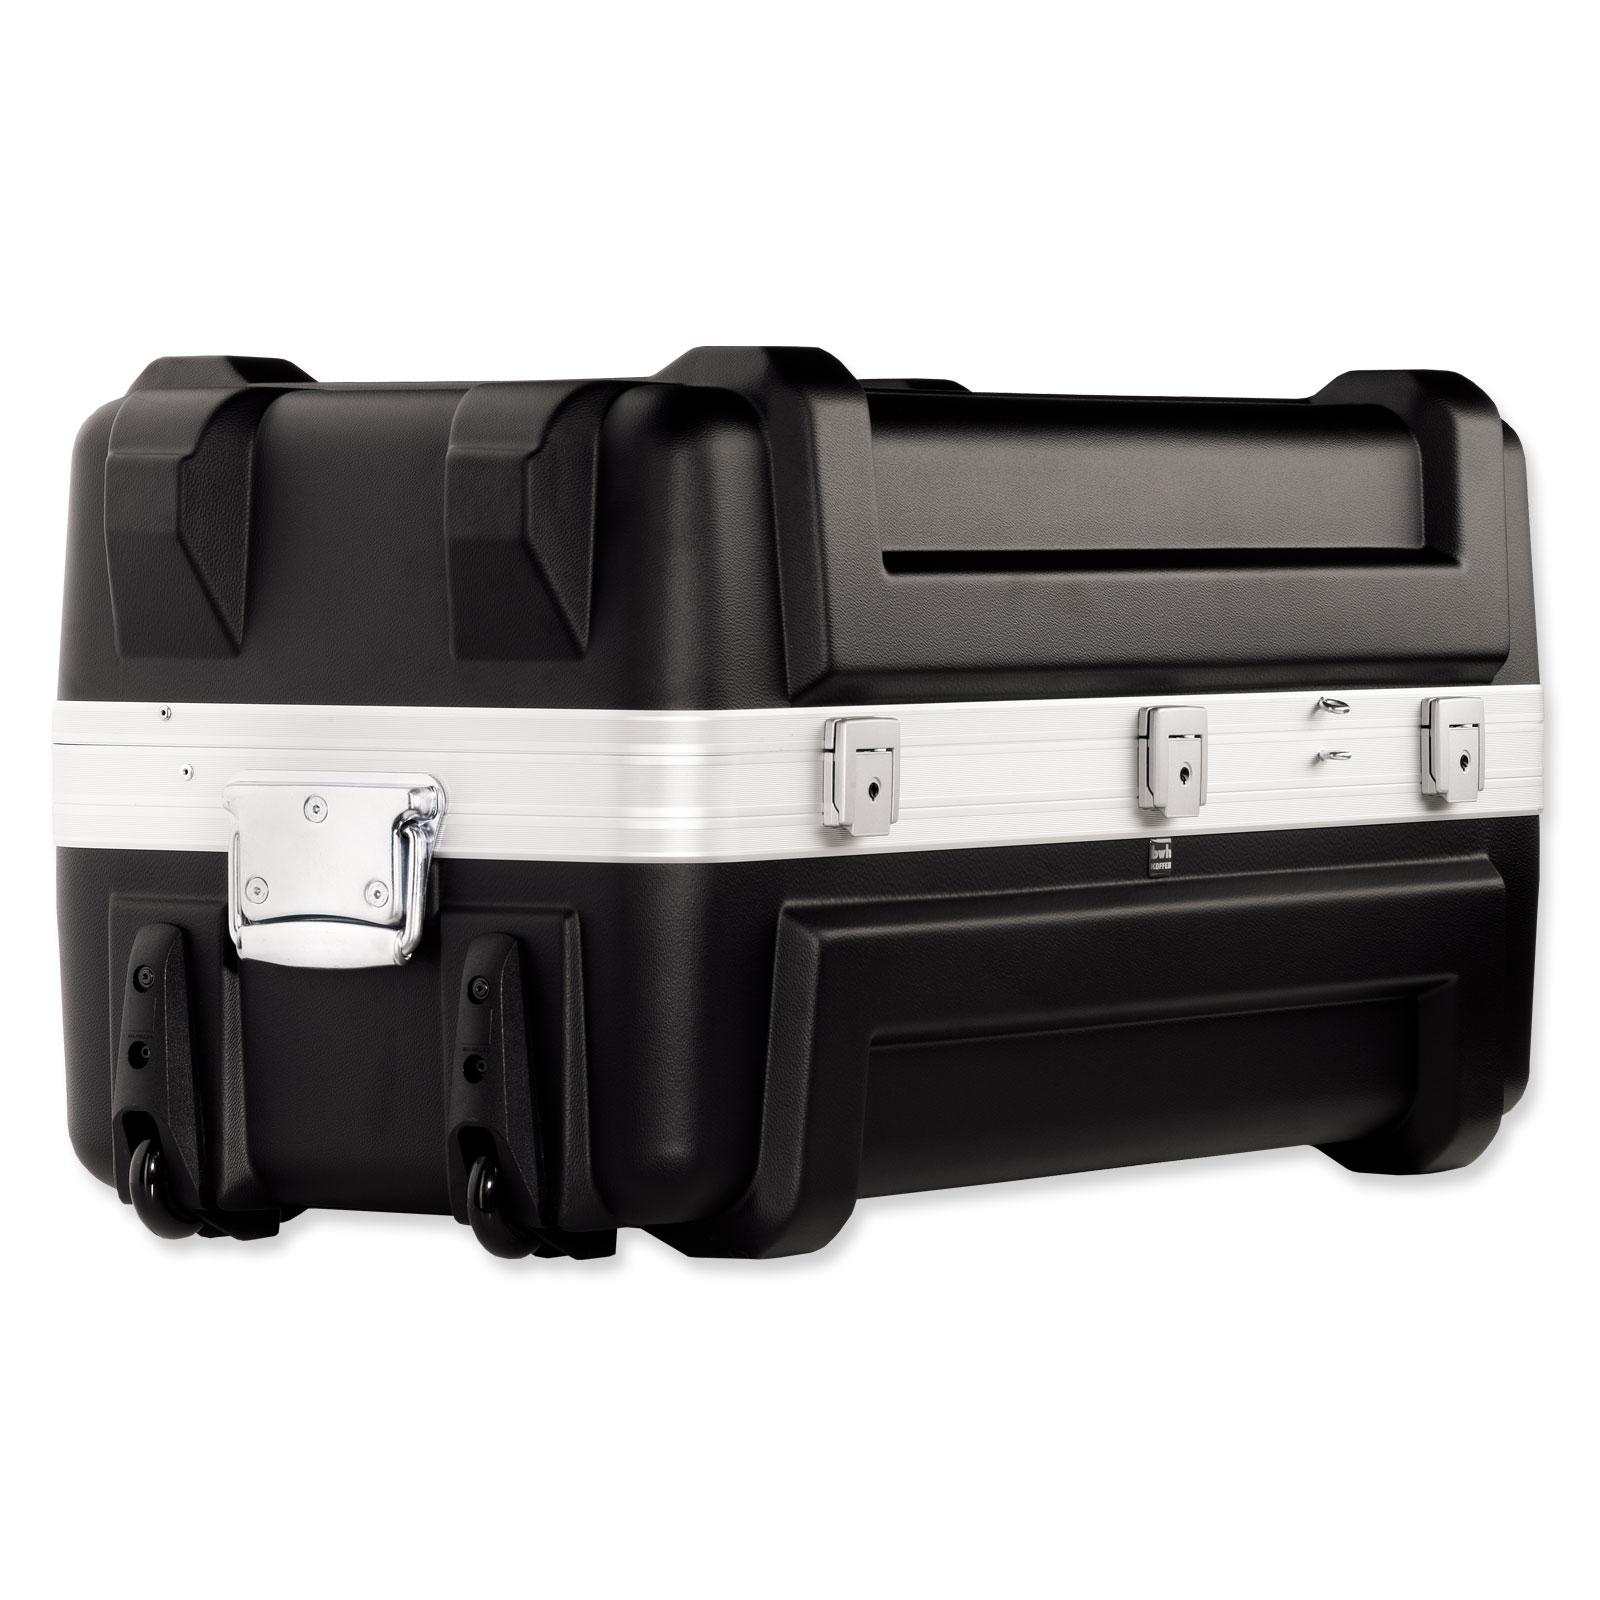 Bwh Koffer Mobil Container Transportbox Schwarz 80 Cm 2 Rollen